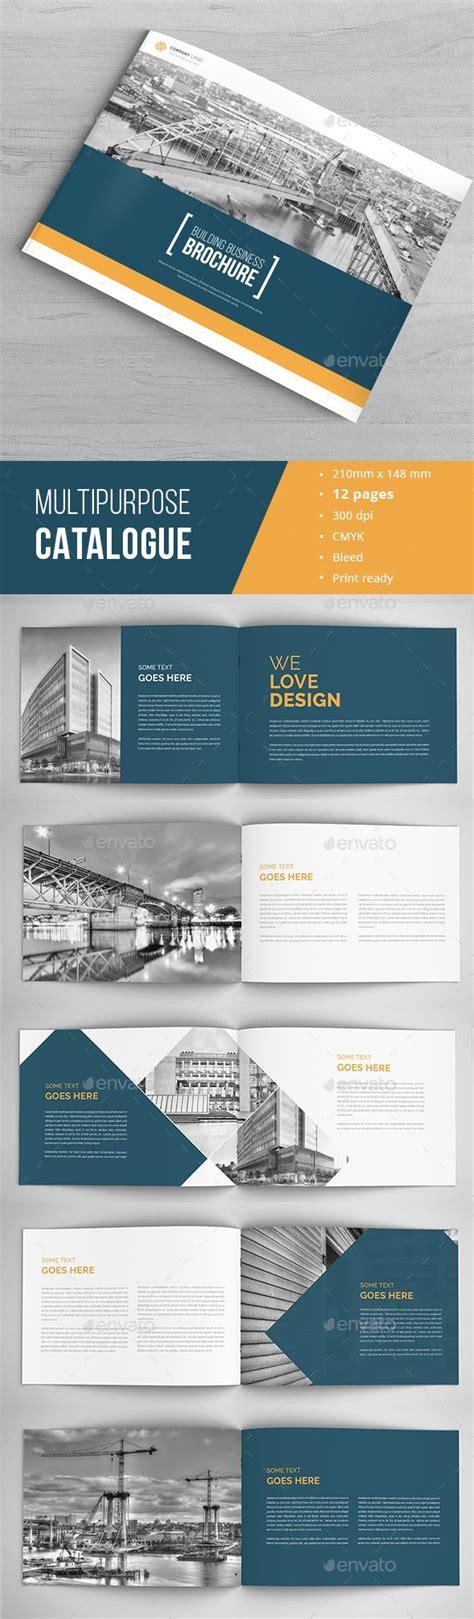 17 best ideas about business brochure on pinterest